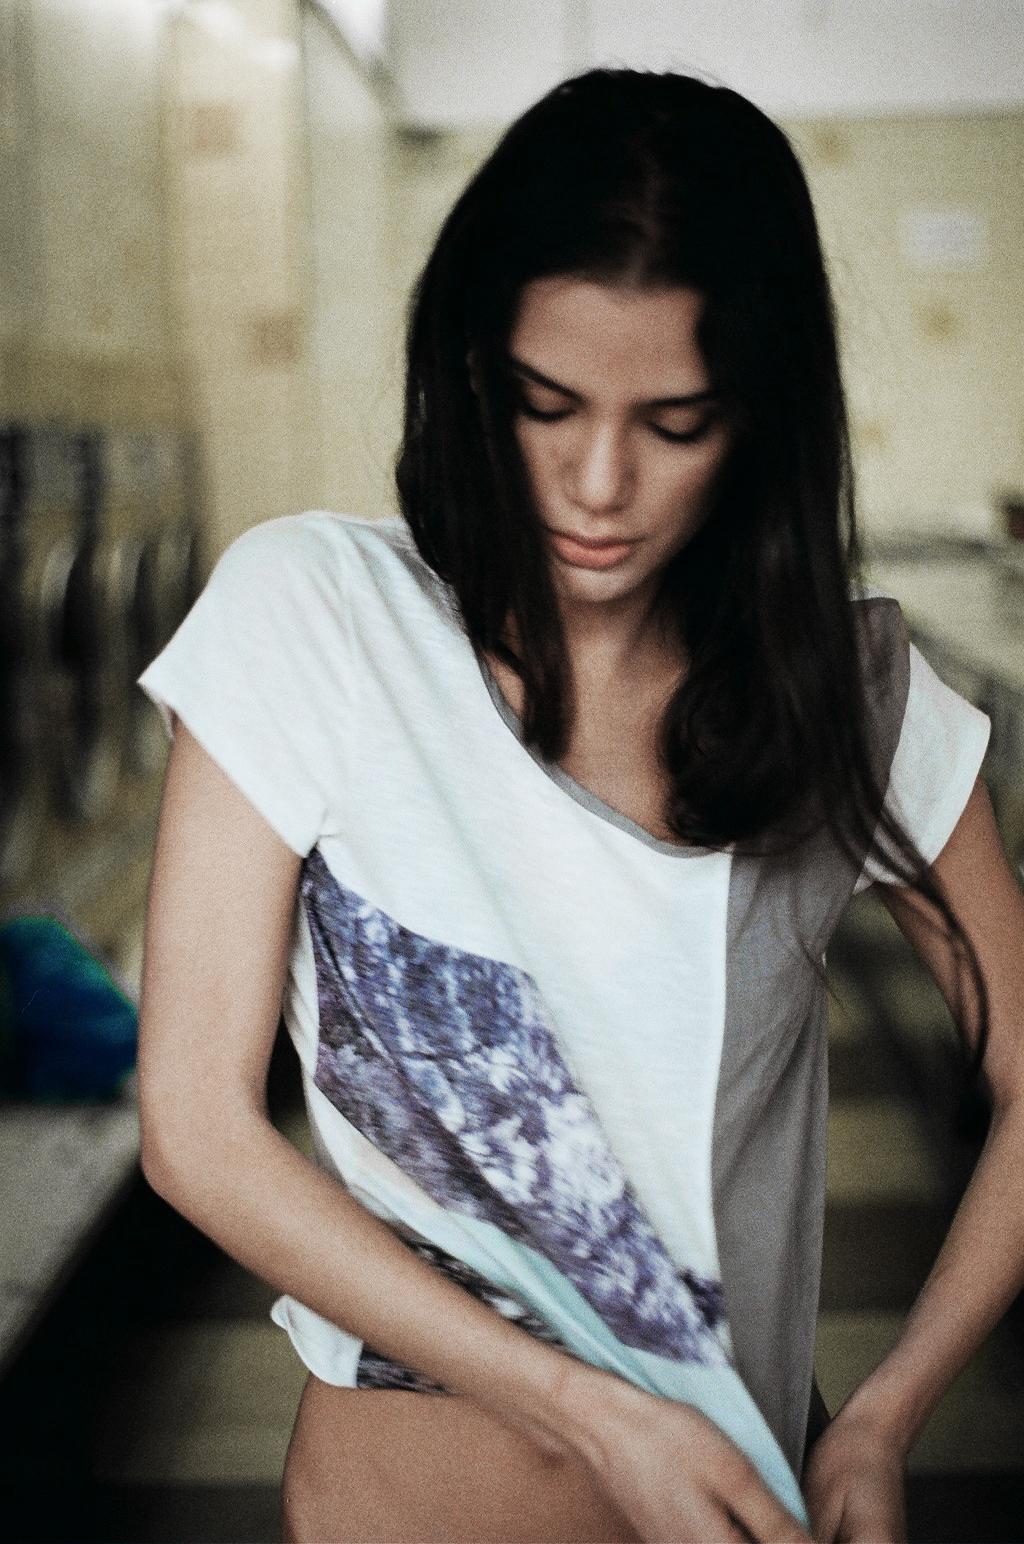 Camilla Atkins Catkins Design New york print designer t-shirt project_4.jpg